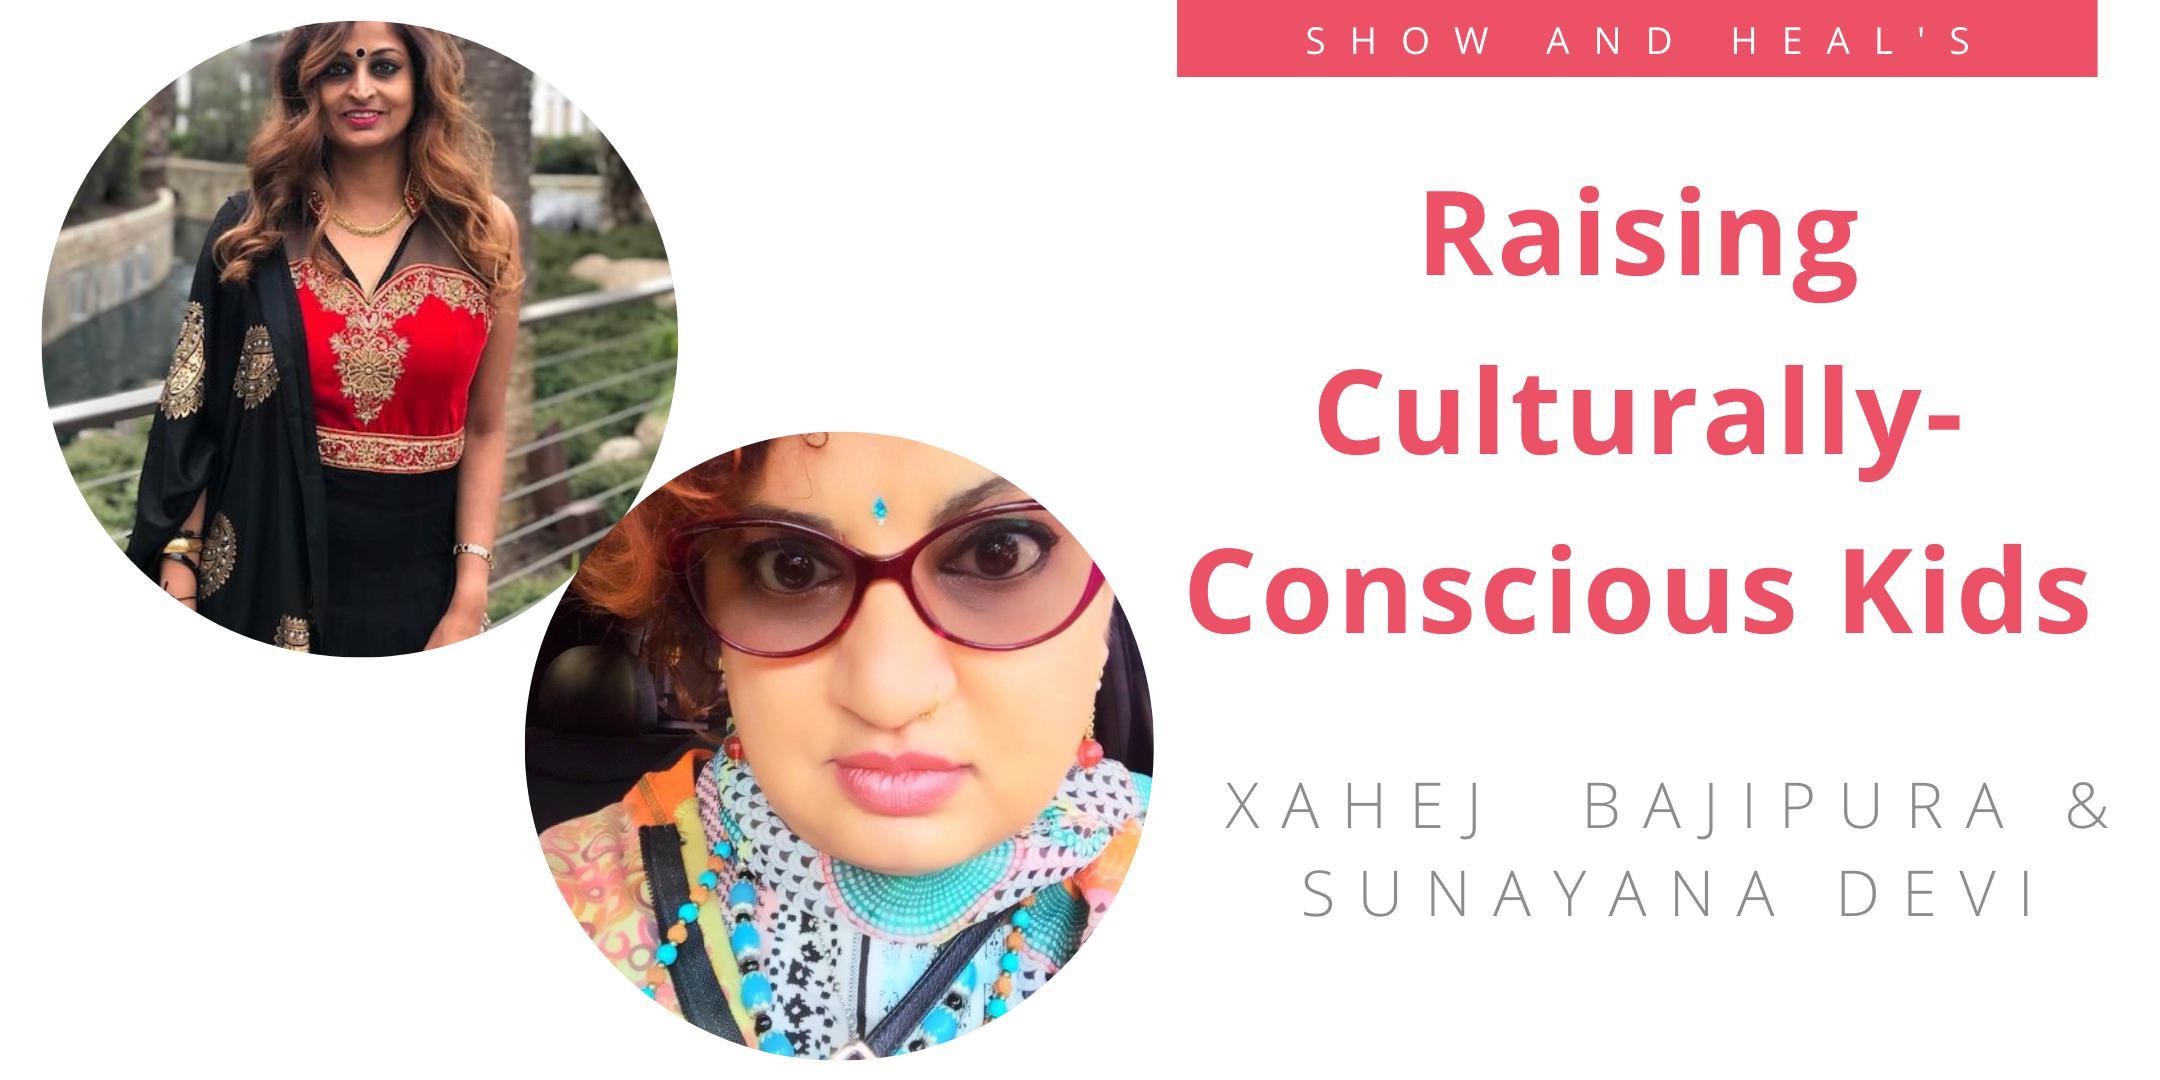 Raising Culturally-Conscious Kids